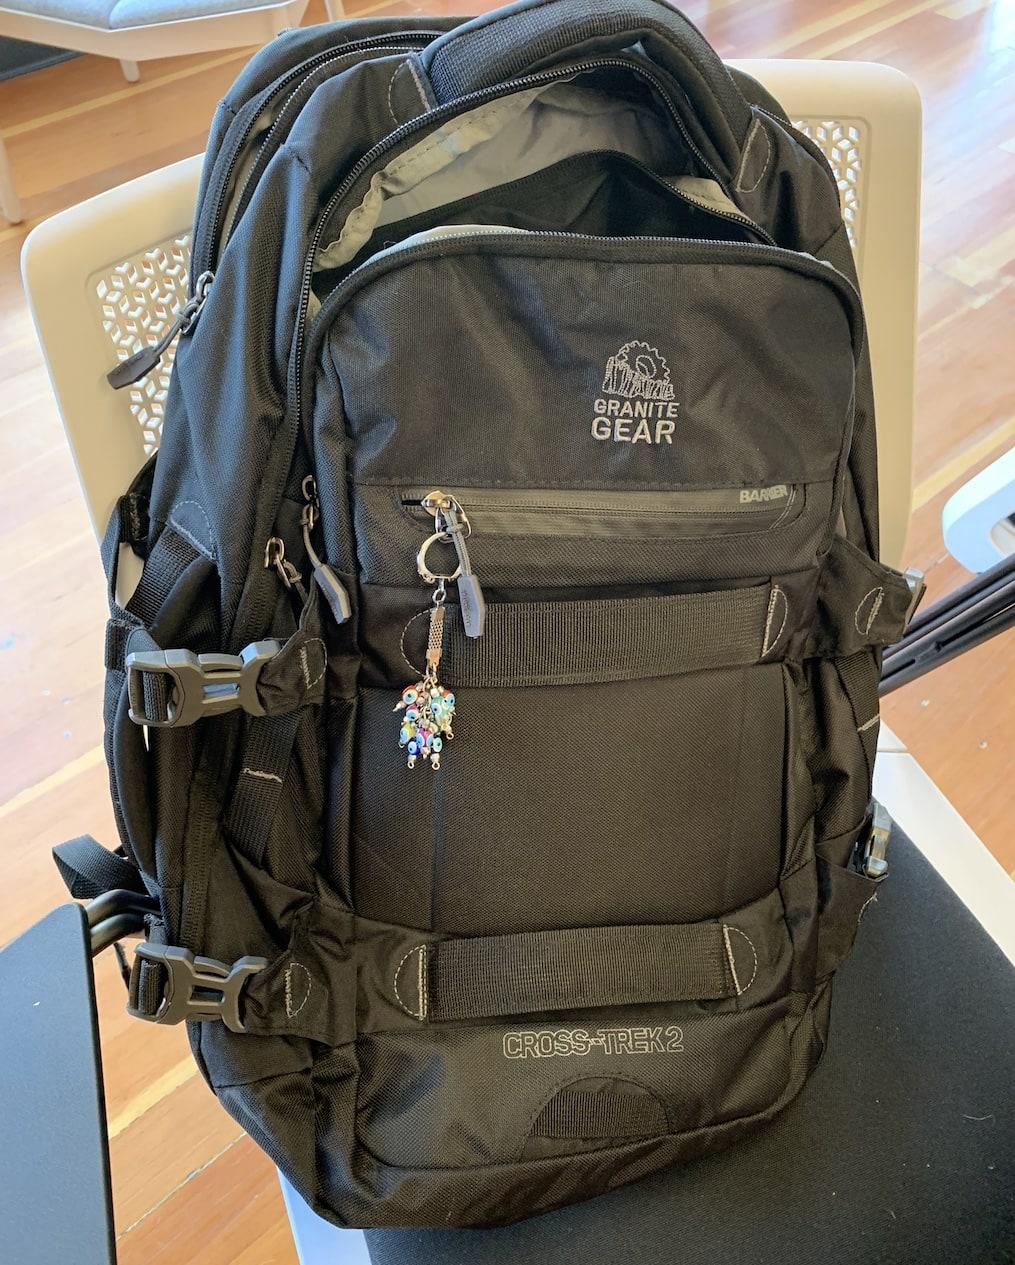 Granite Gear Cross-Trek2 Back Pack Holiday GIft Idea